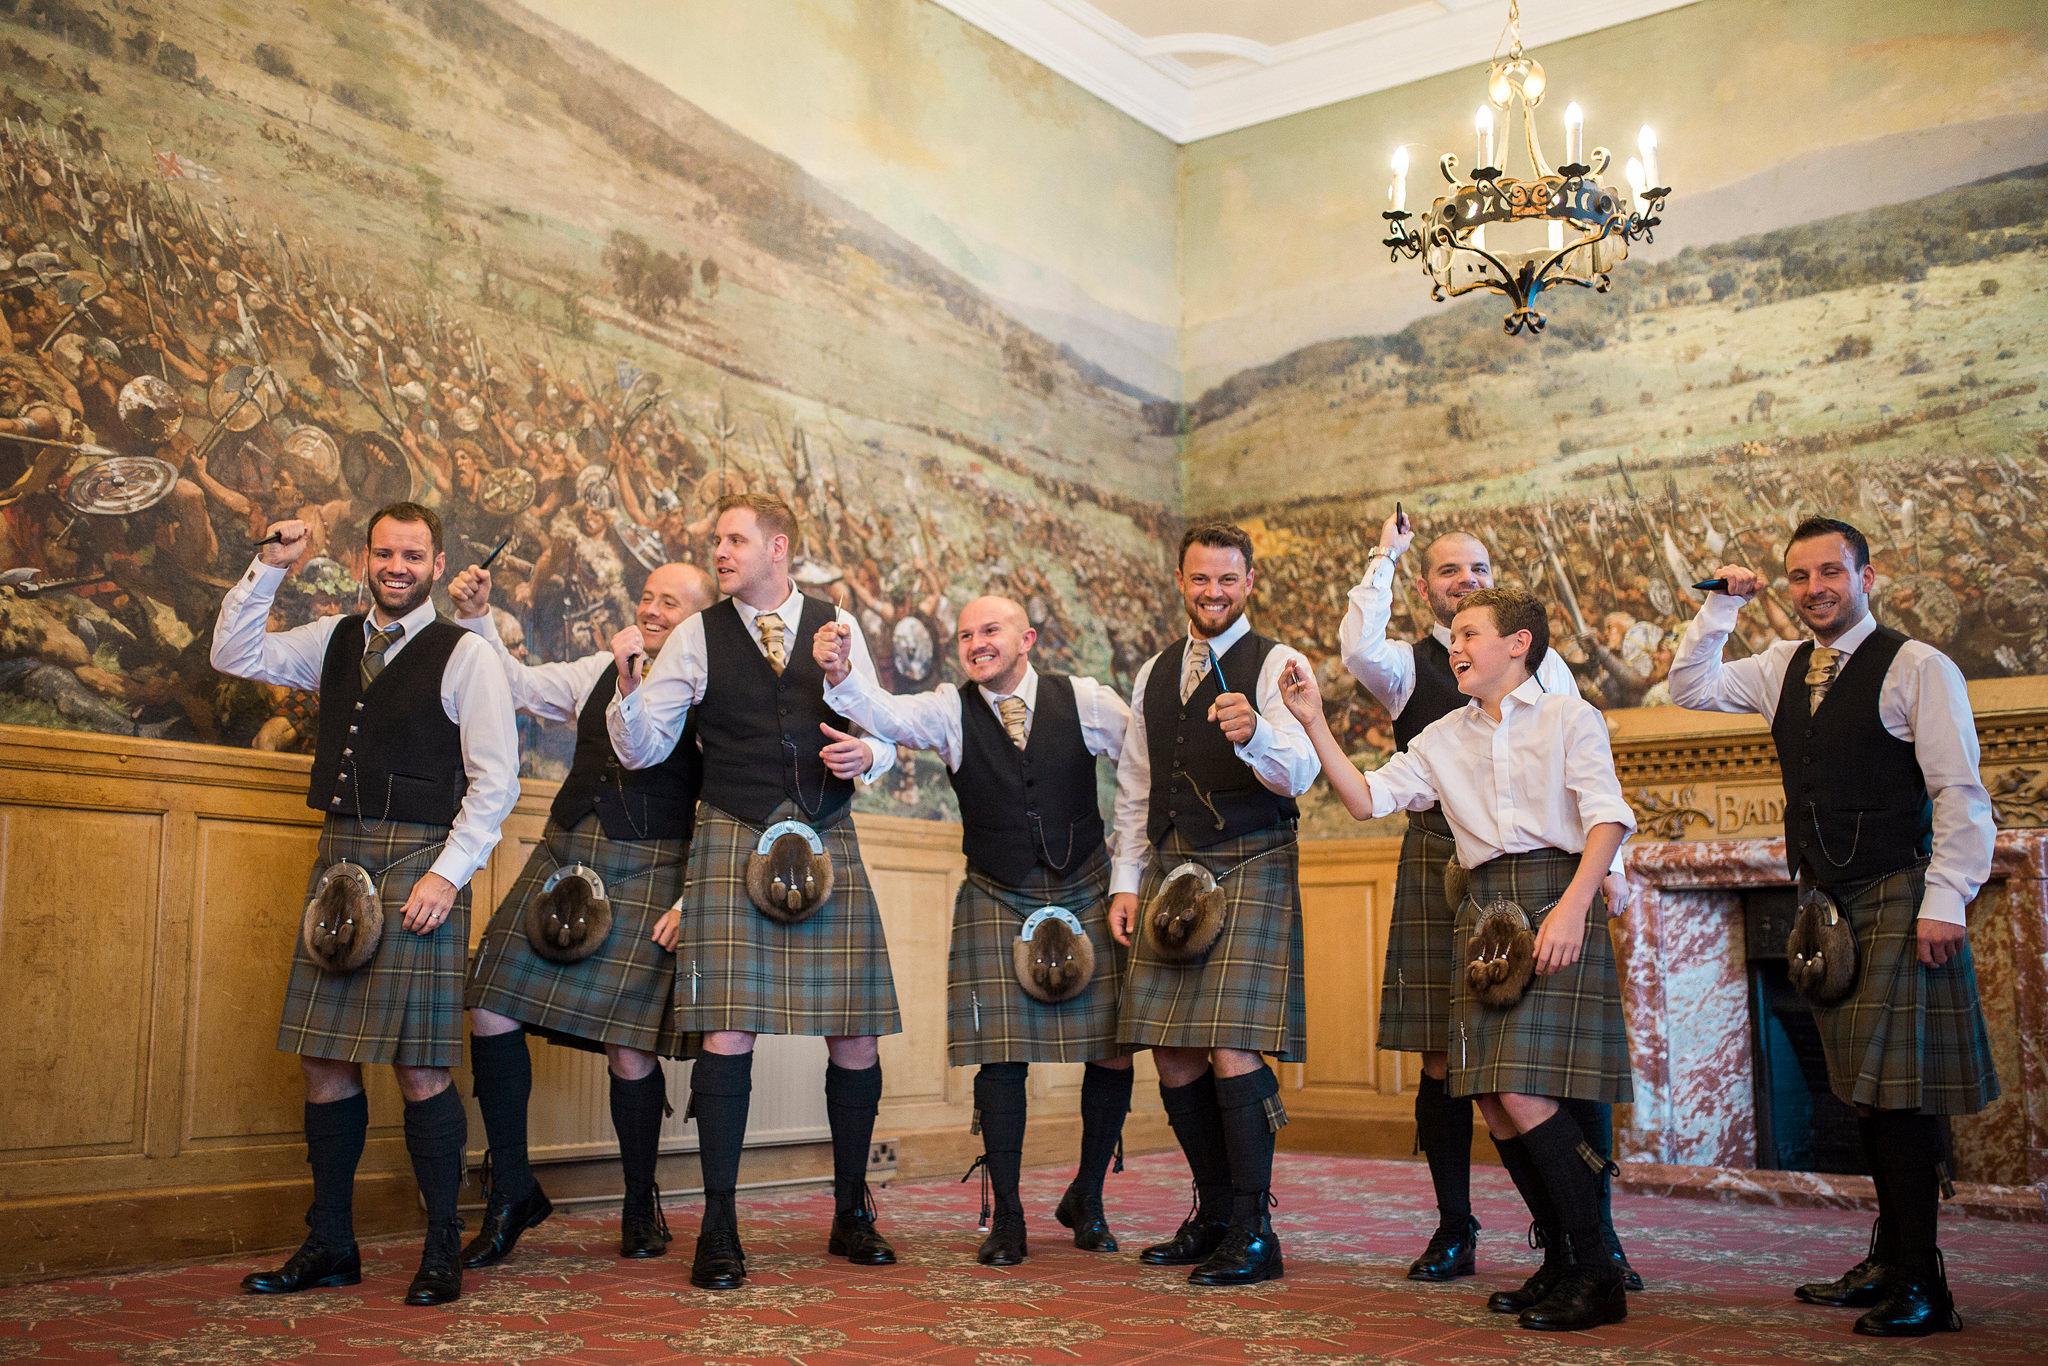 063-scotland-wedding-photographer.jpg